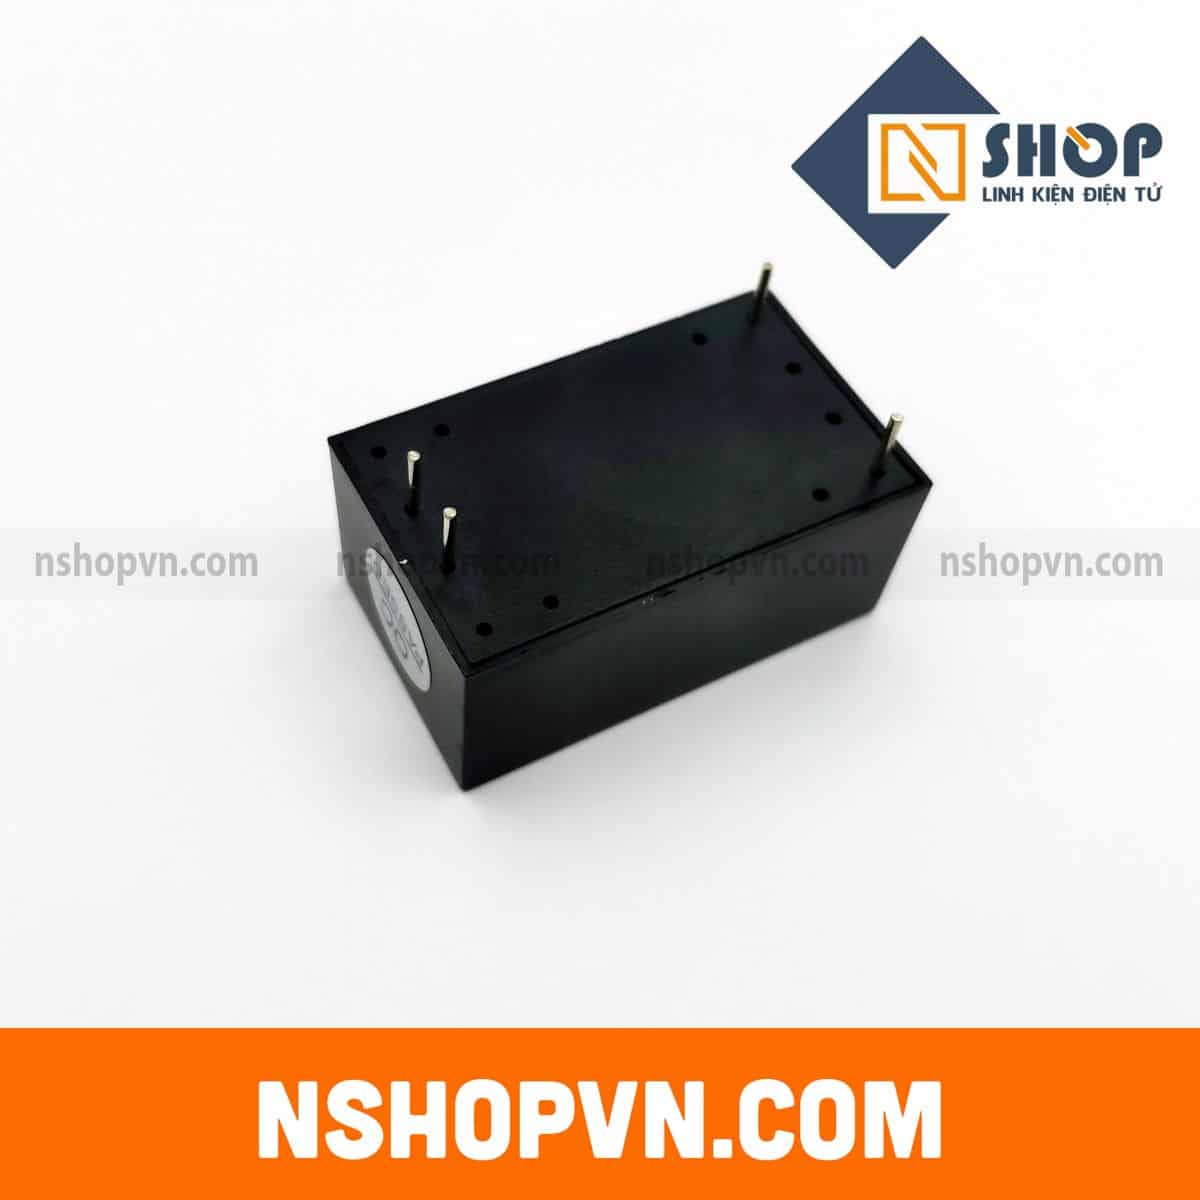 Module Nguồn AC-DC Hi-Link HLK-PM01 12VDC 3W;